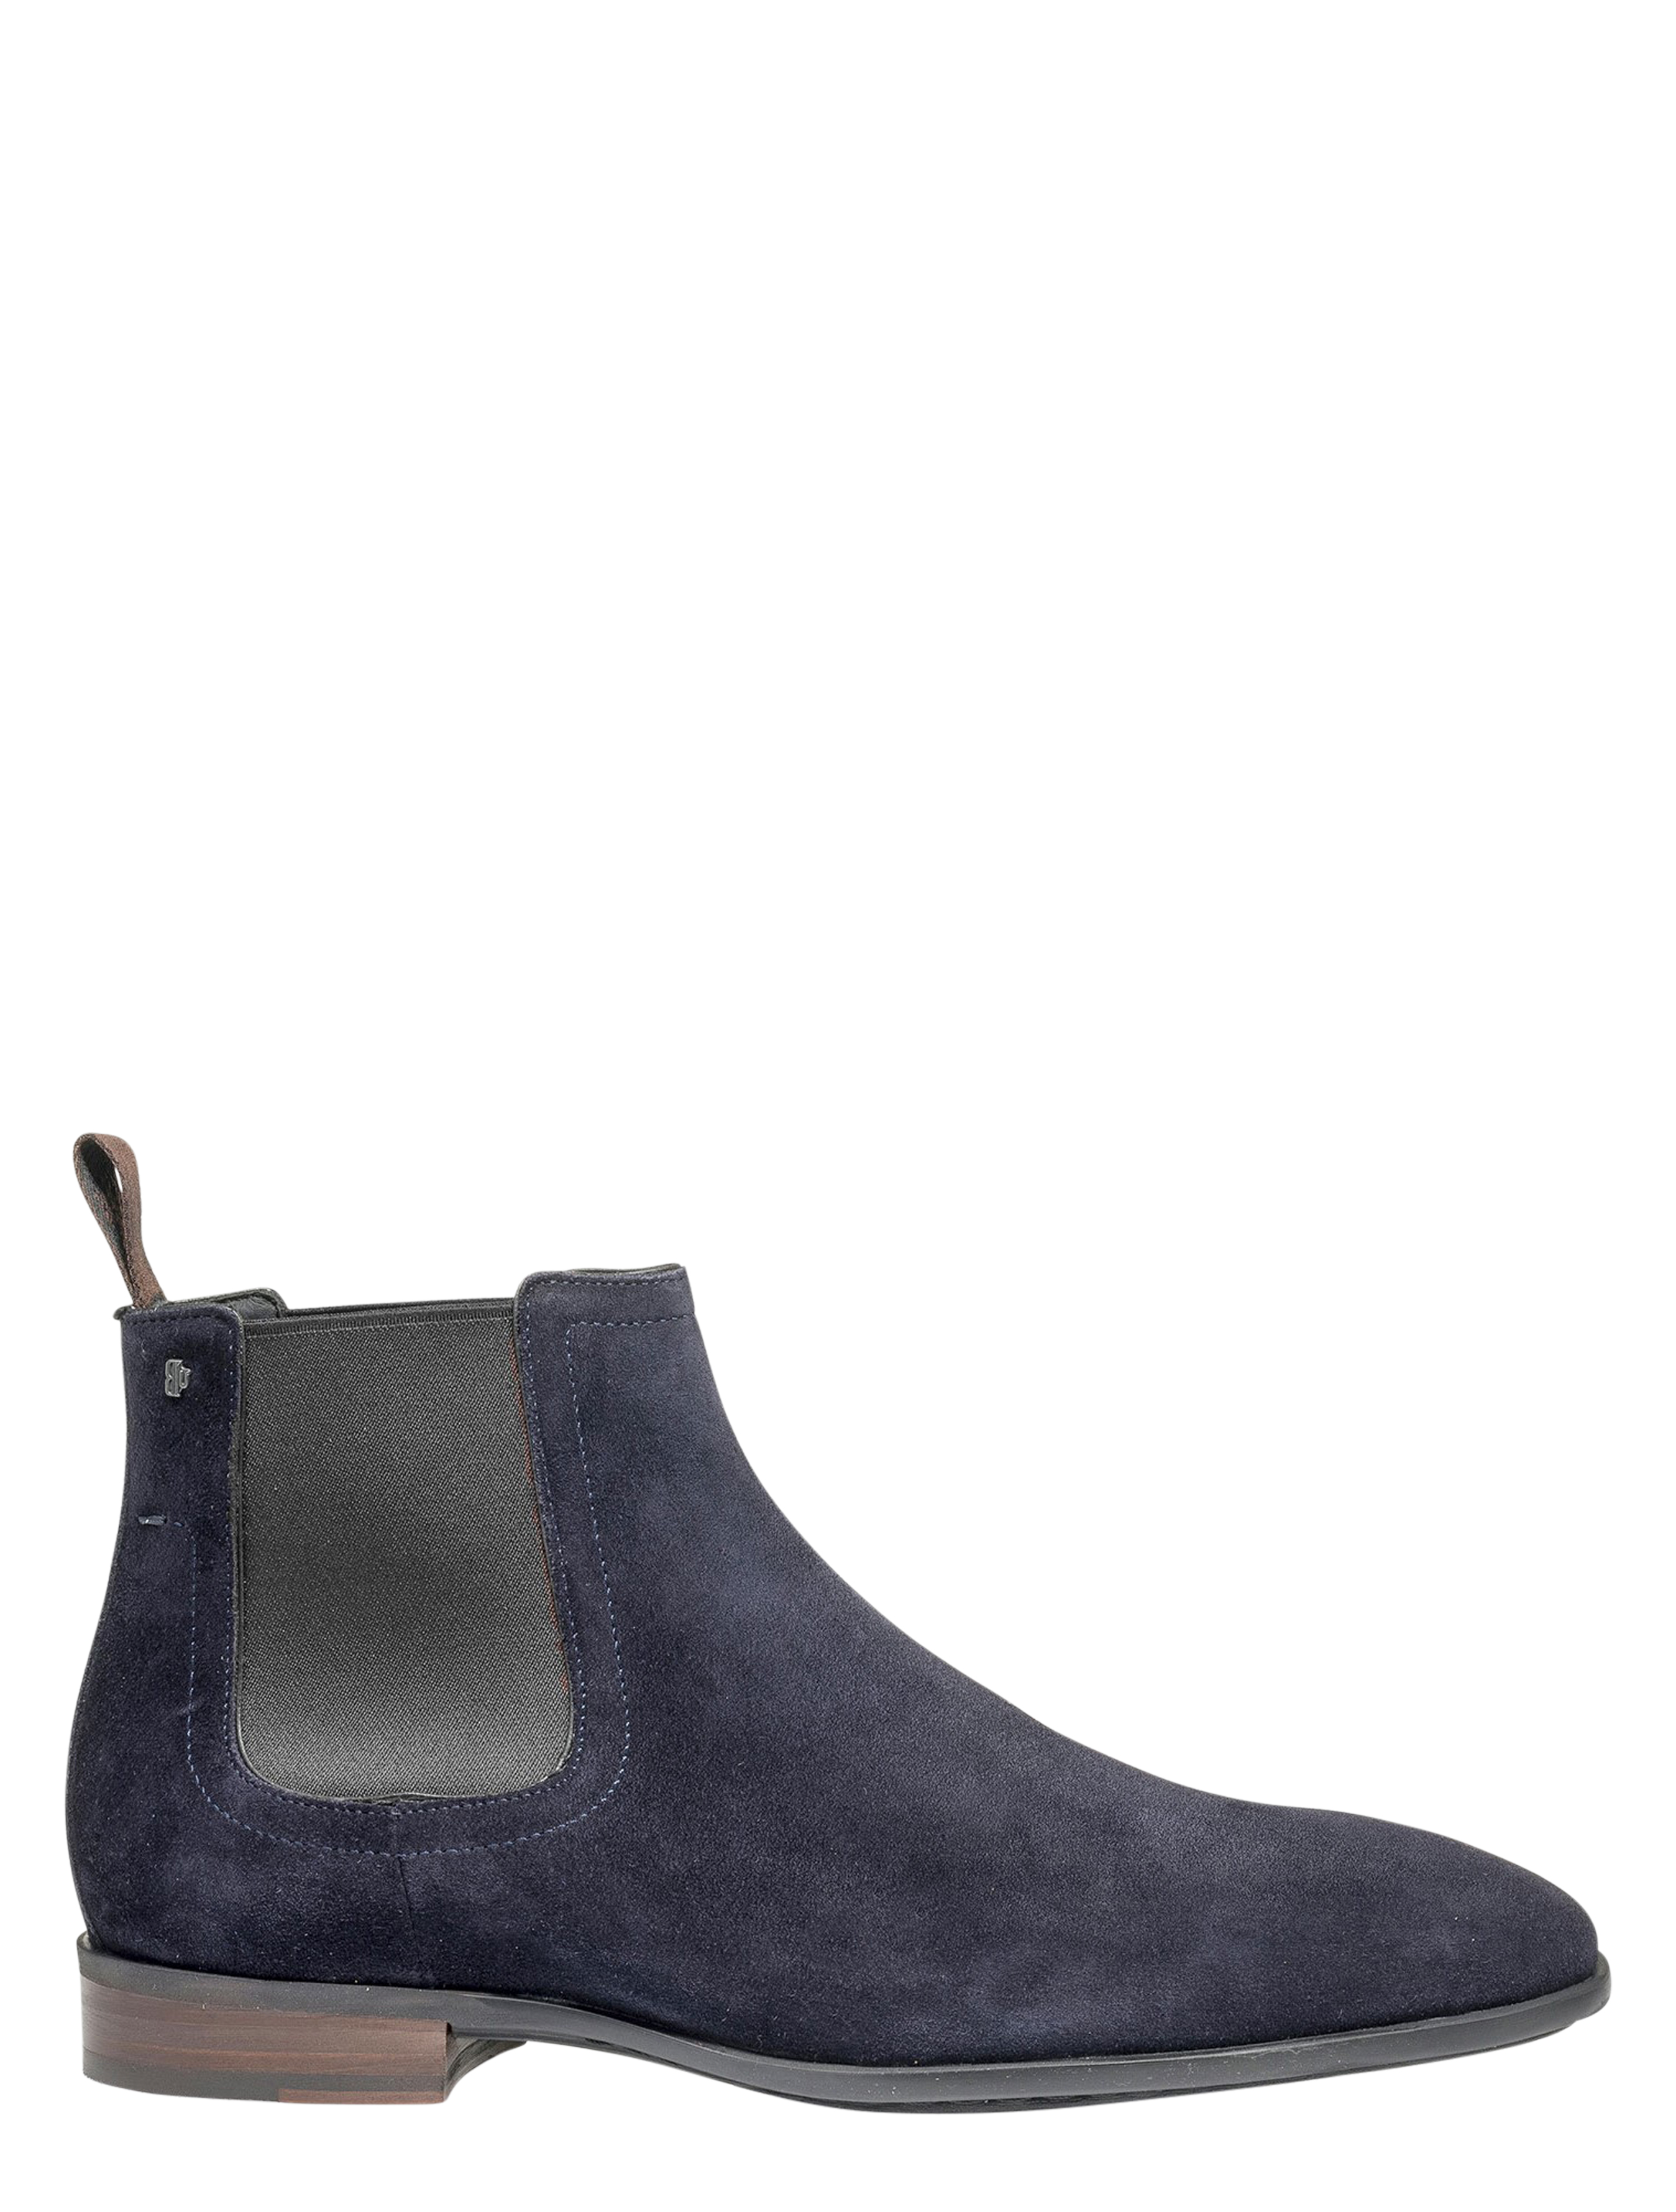 Van Bommel 10342 Dark Blue G+ Wijdte Boots